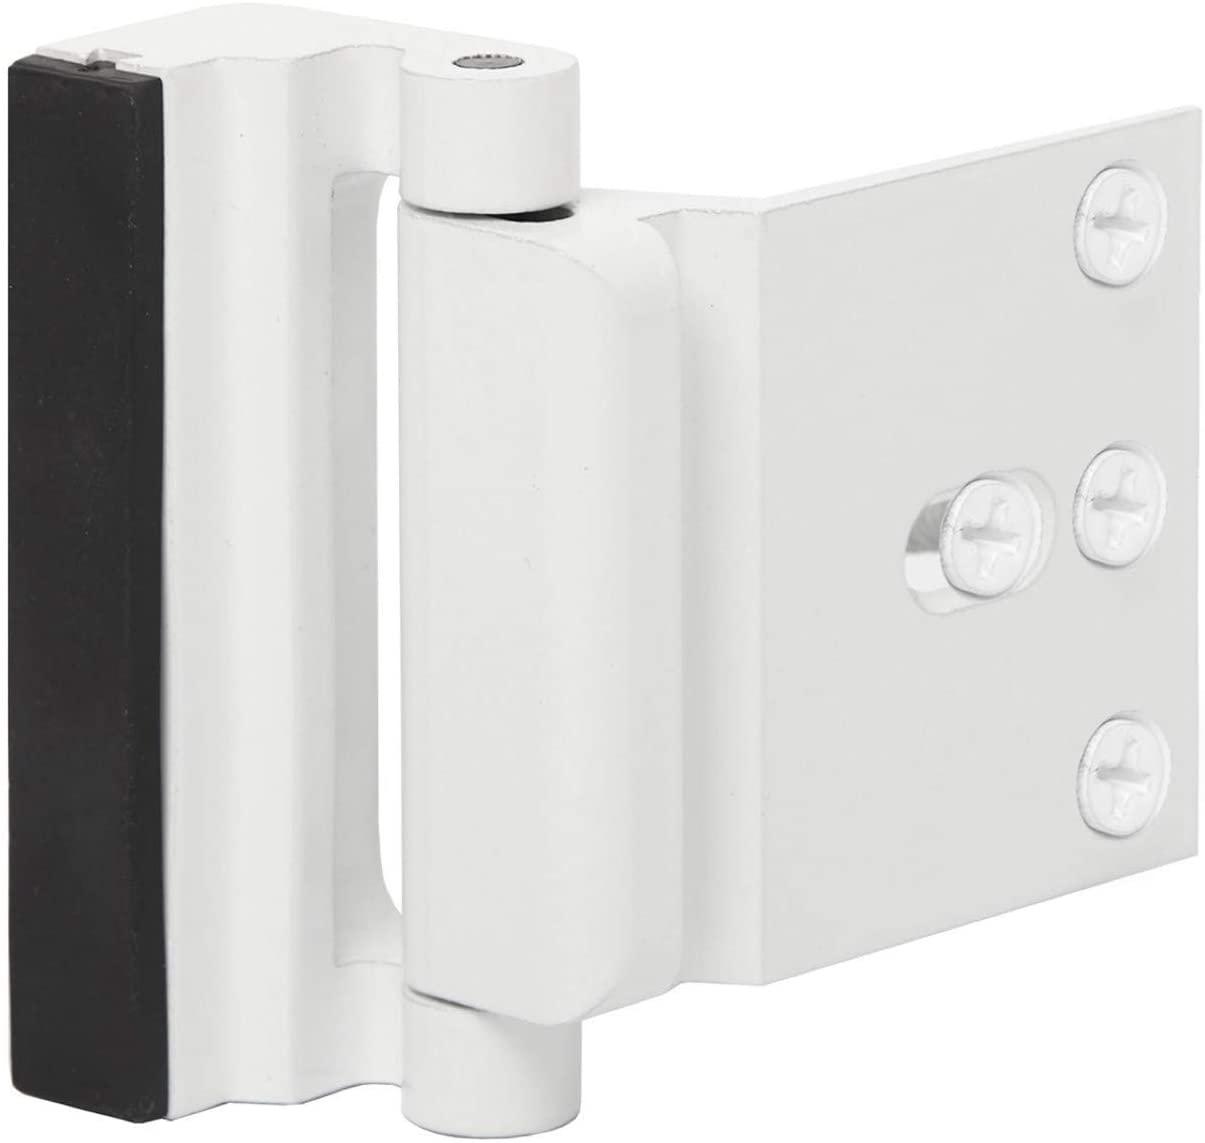 Door Reinforcement Lock Child Safety Door Security Lock with 4 Screws for Inward Swinging Door-Add Extra,High Security to Your Home Prevent Unauthorized Entry-3